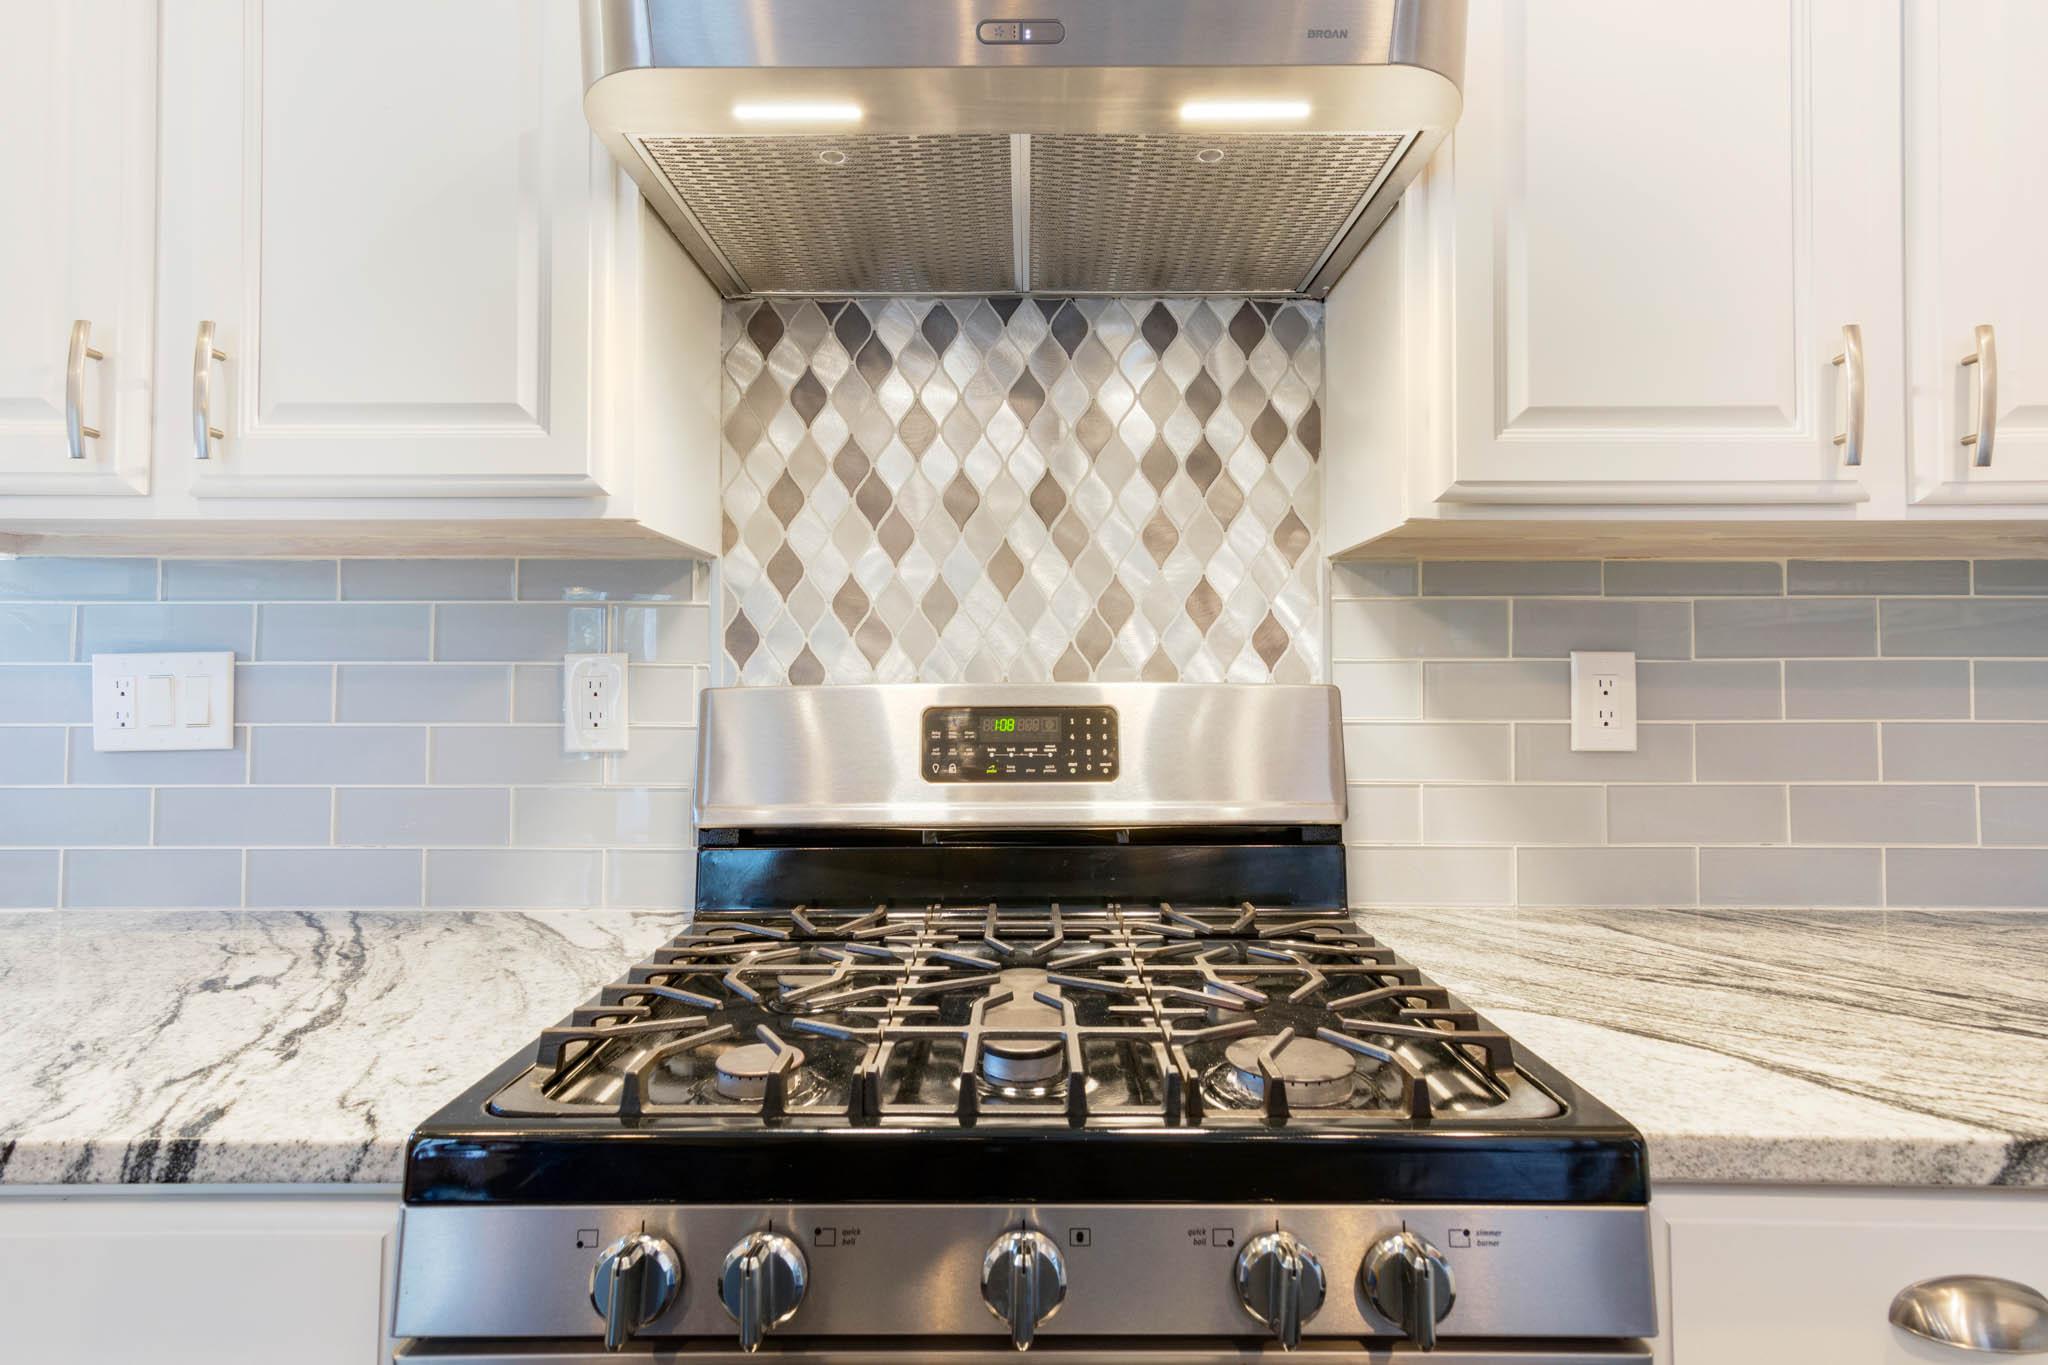 real_estate_photographer_kitchen_photography-8.jpg